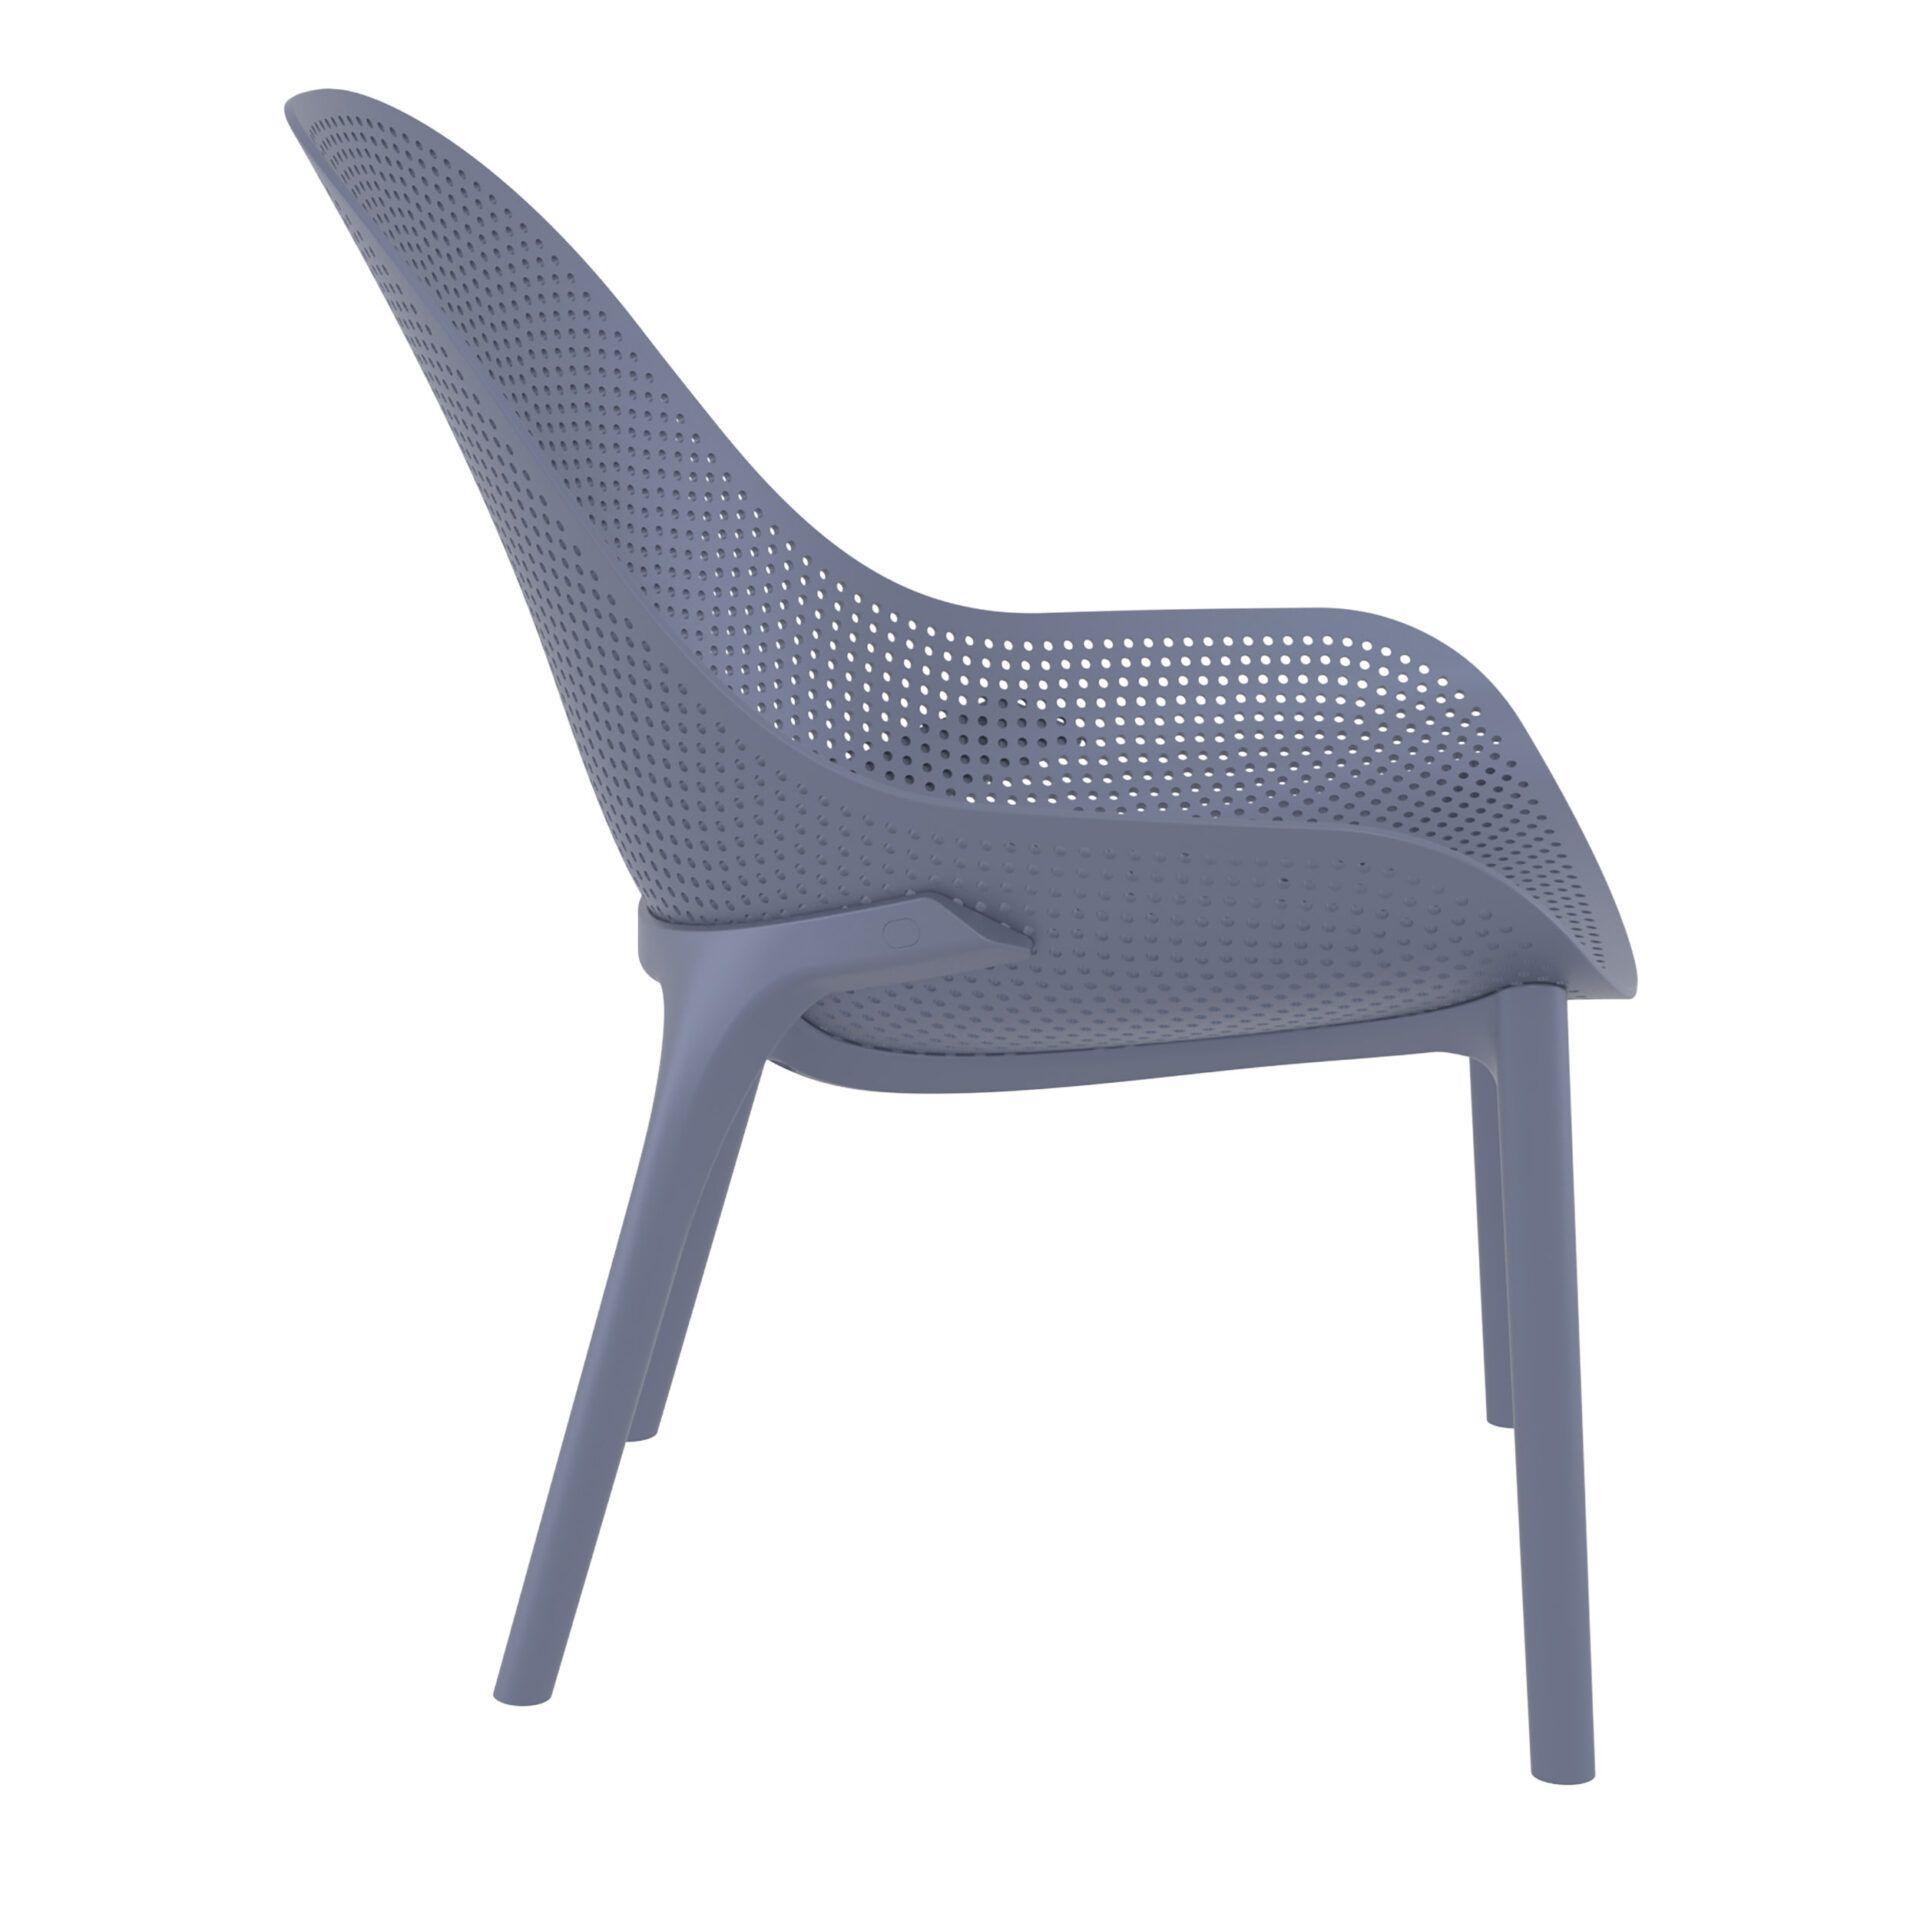 outdoor seating polypropylene sky lounge darkgrey side